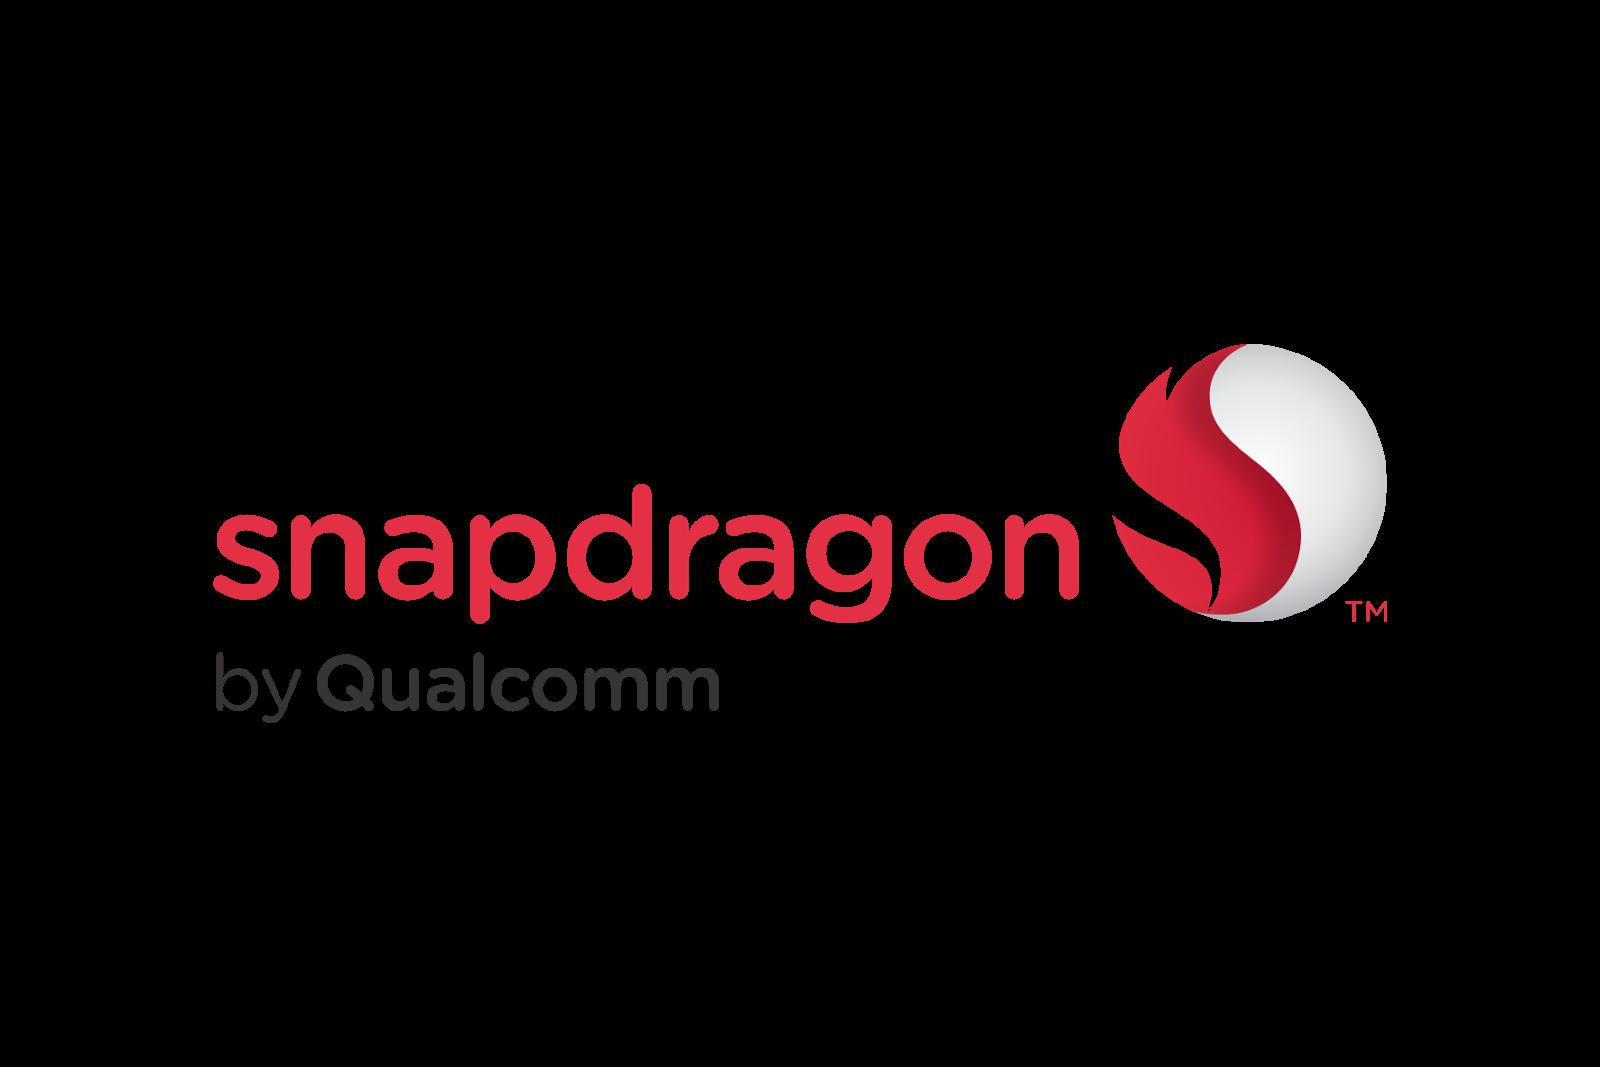 Qualcomm Snapdragon Logo Png